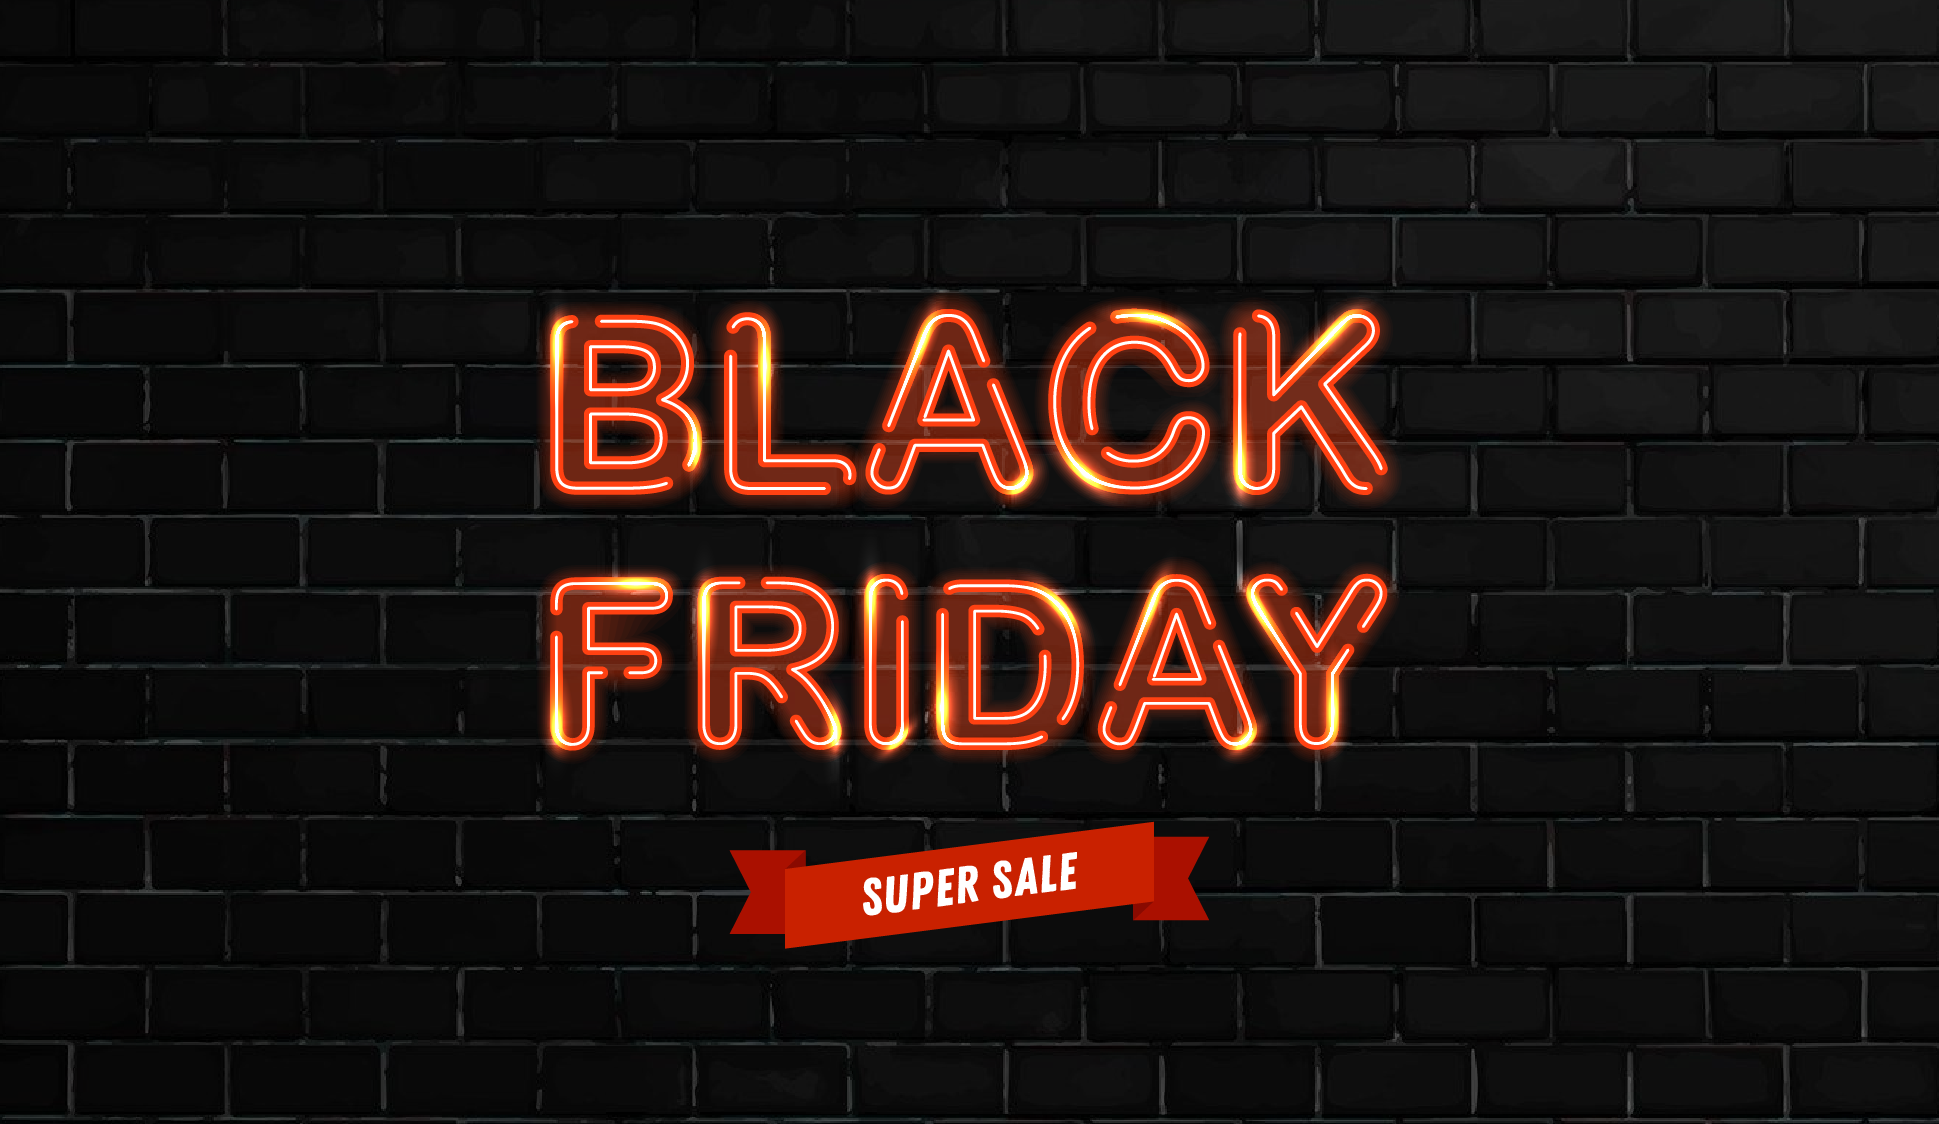 brick-banner-675x345-black-friday-sale-2020-sale.png